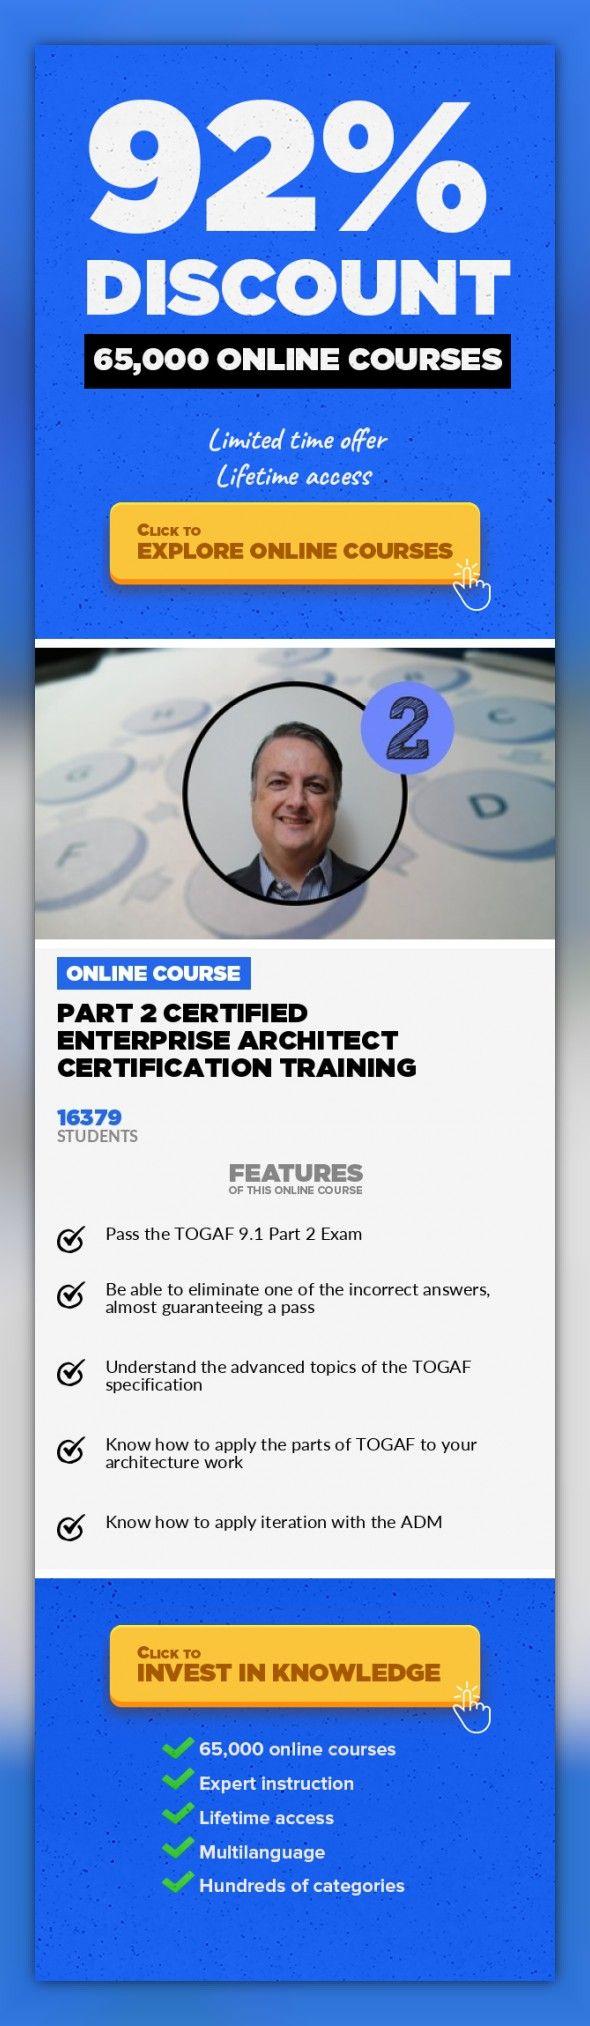 Part 2 Certified Enterprise Architect Certification Training